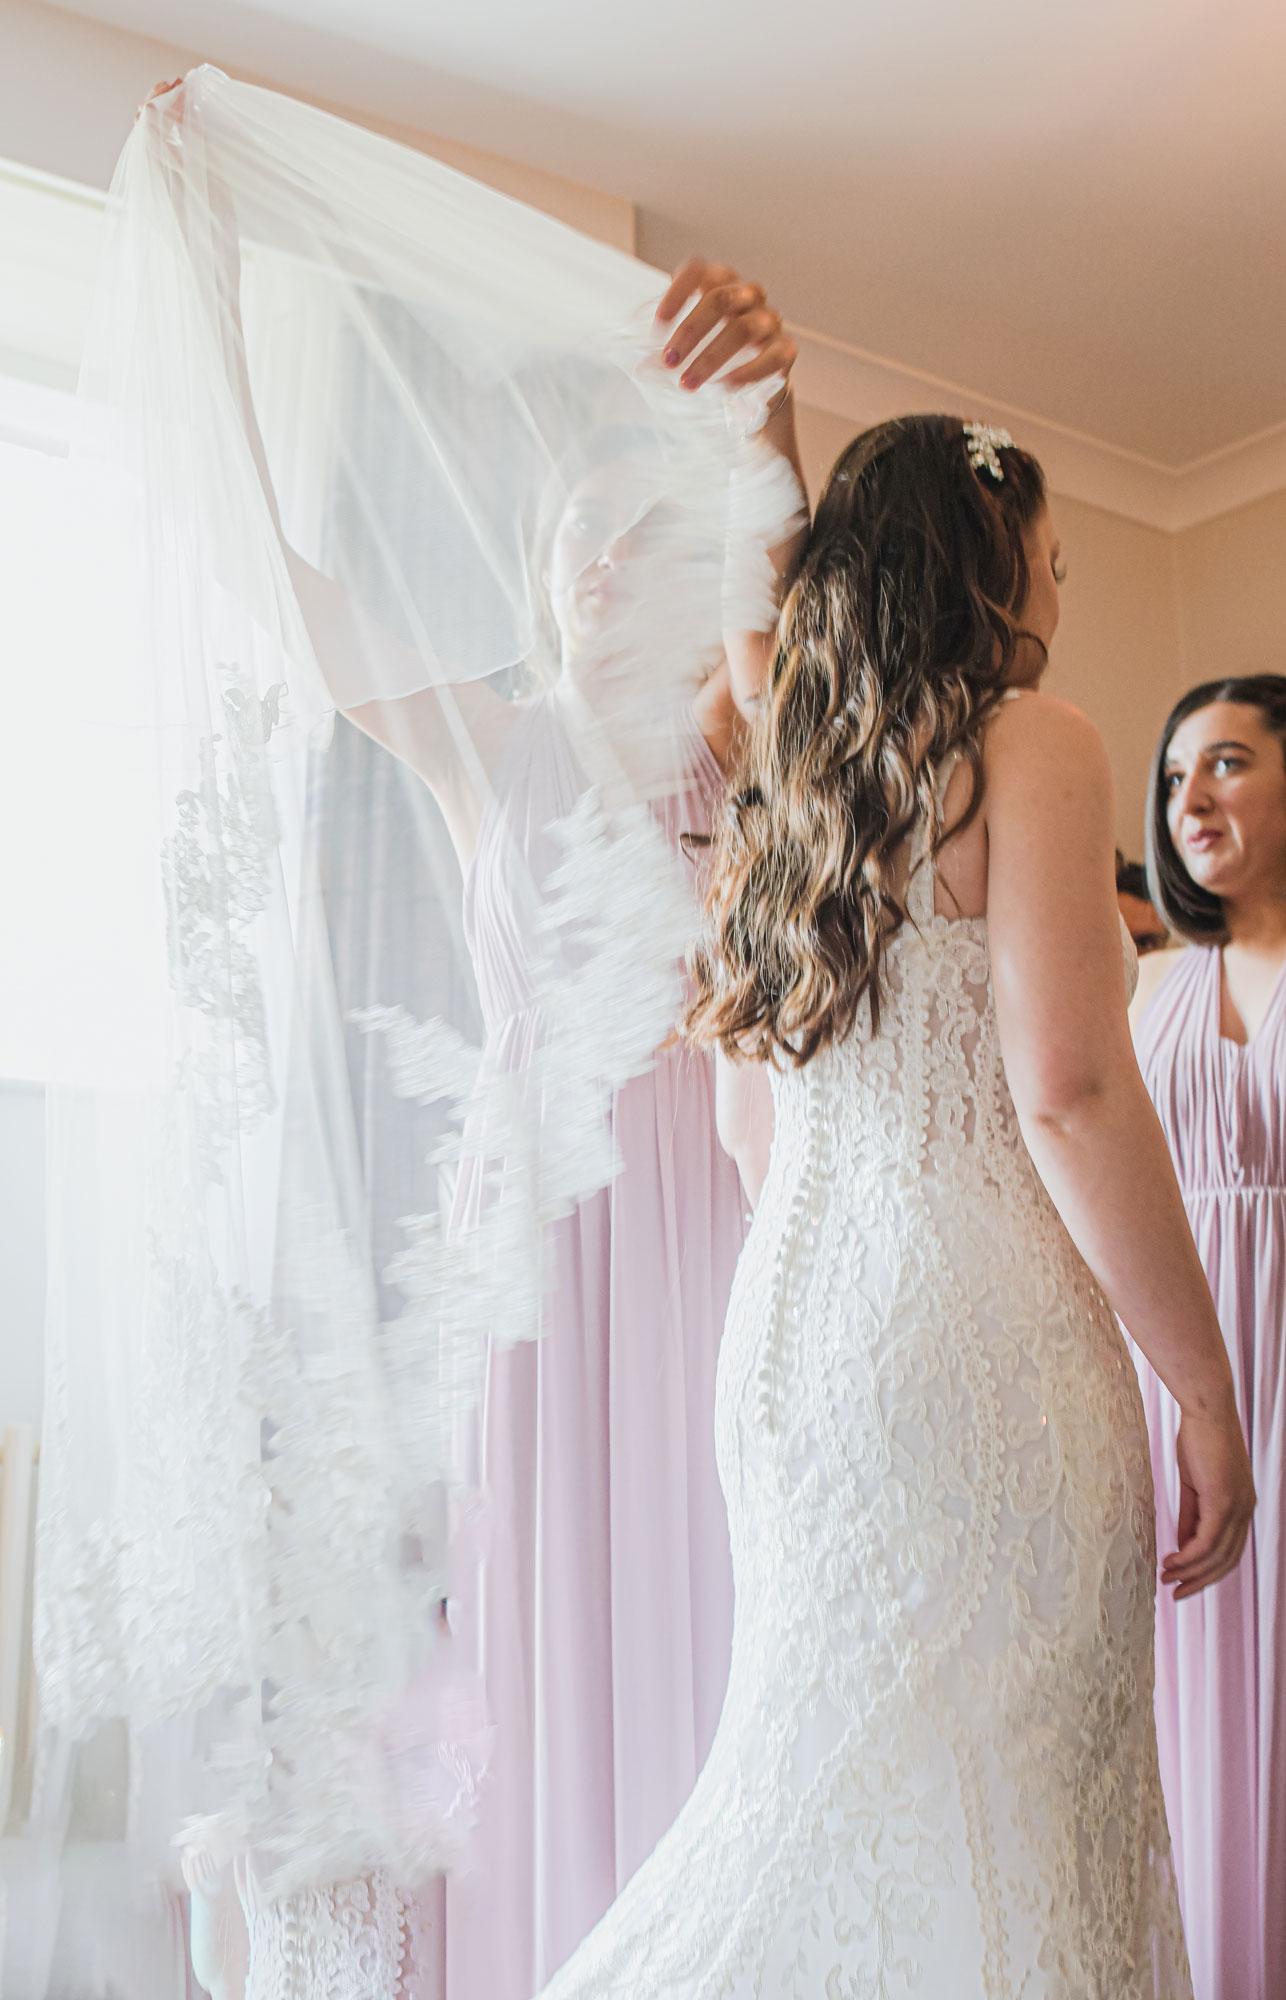 Wotton House Bridal Photography